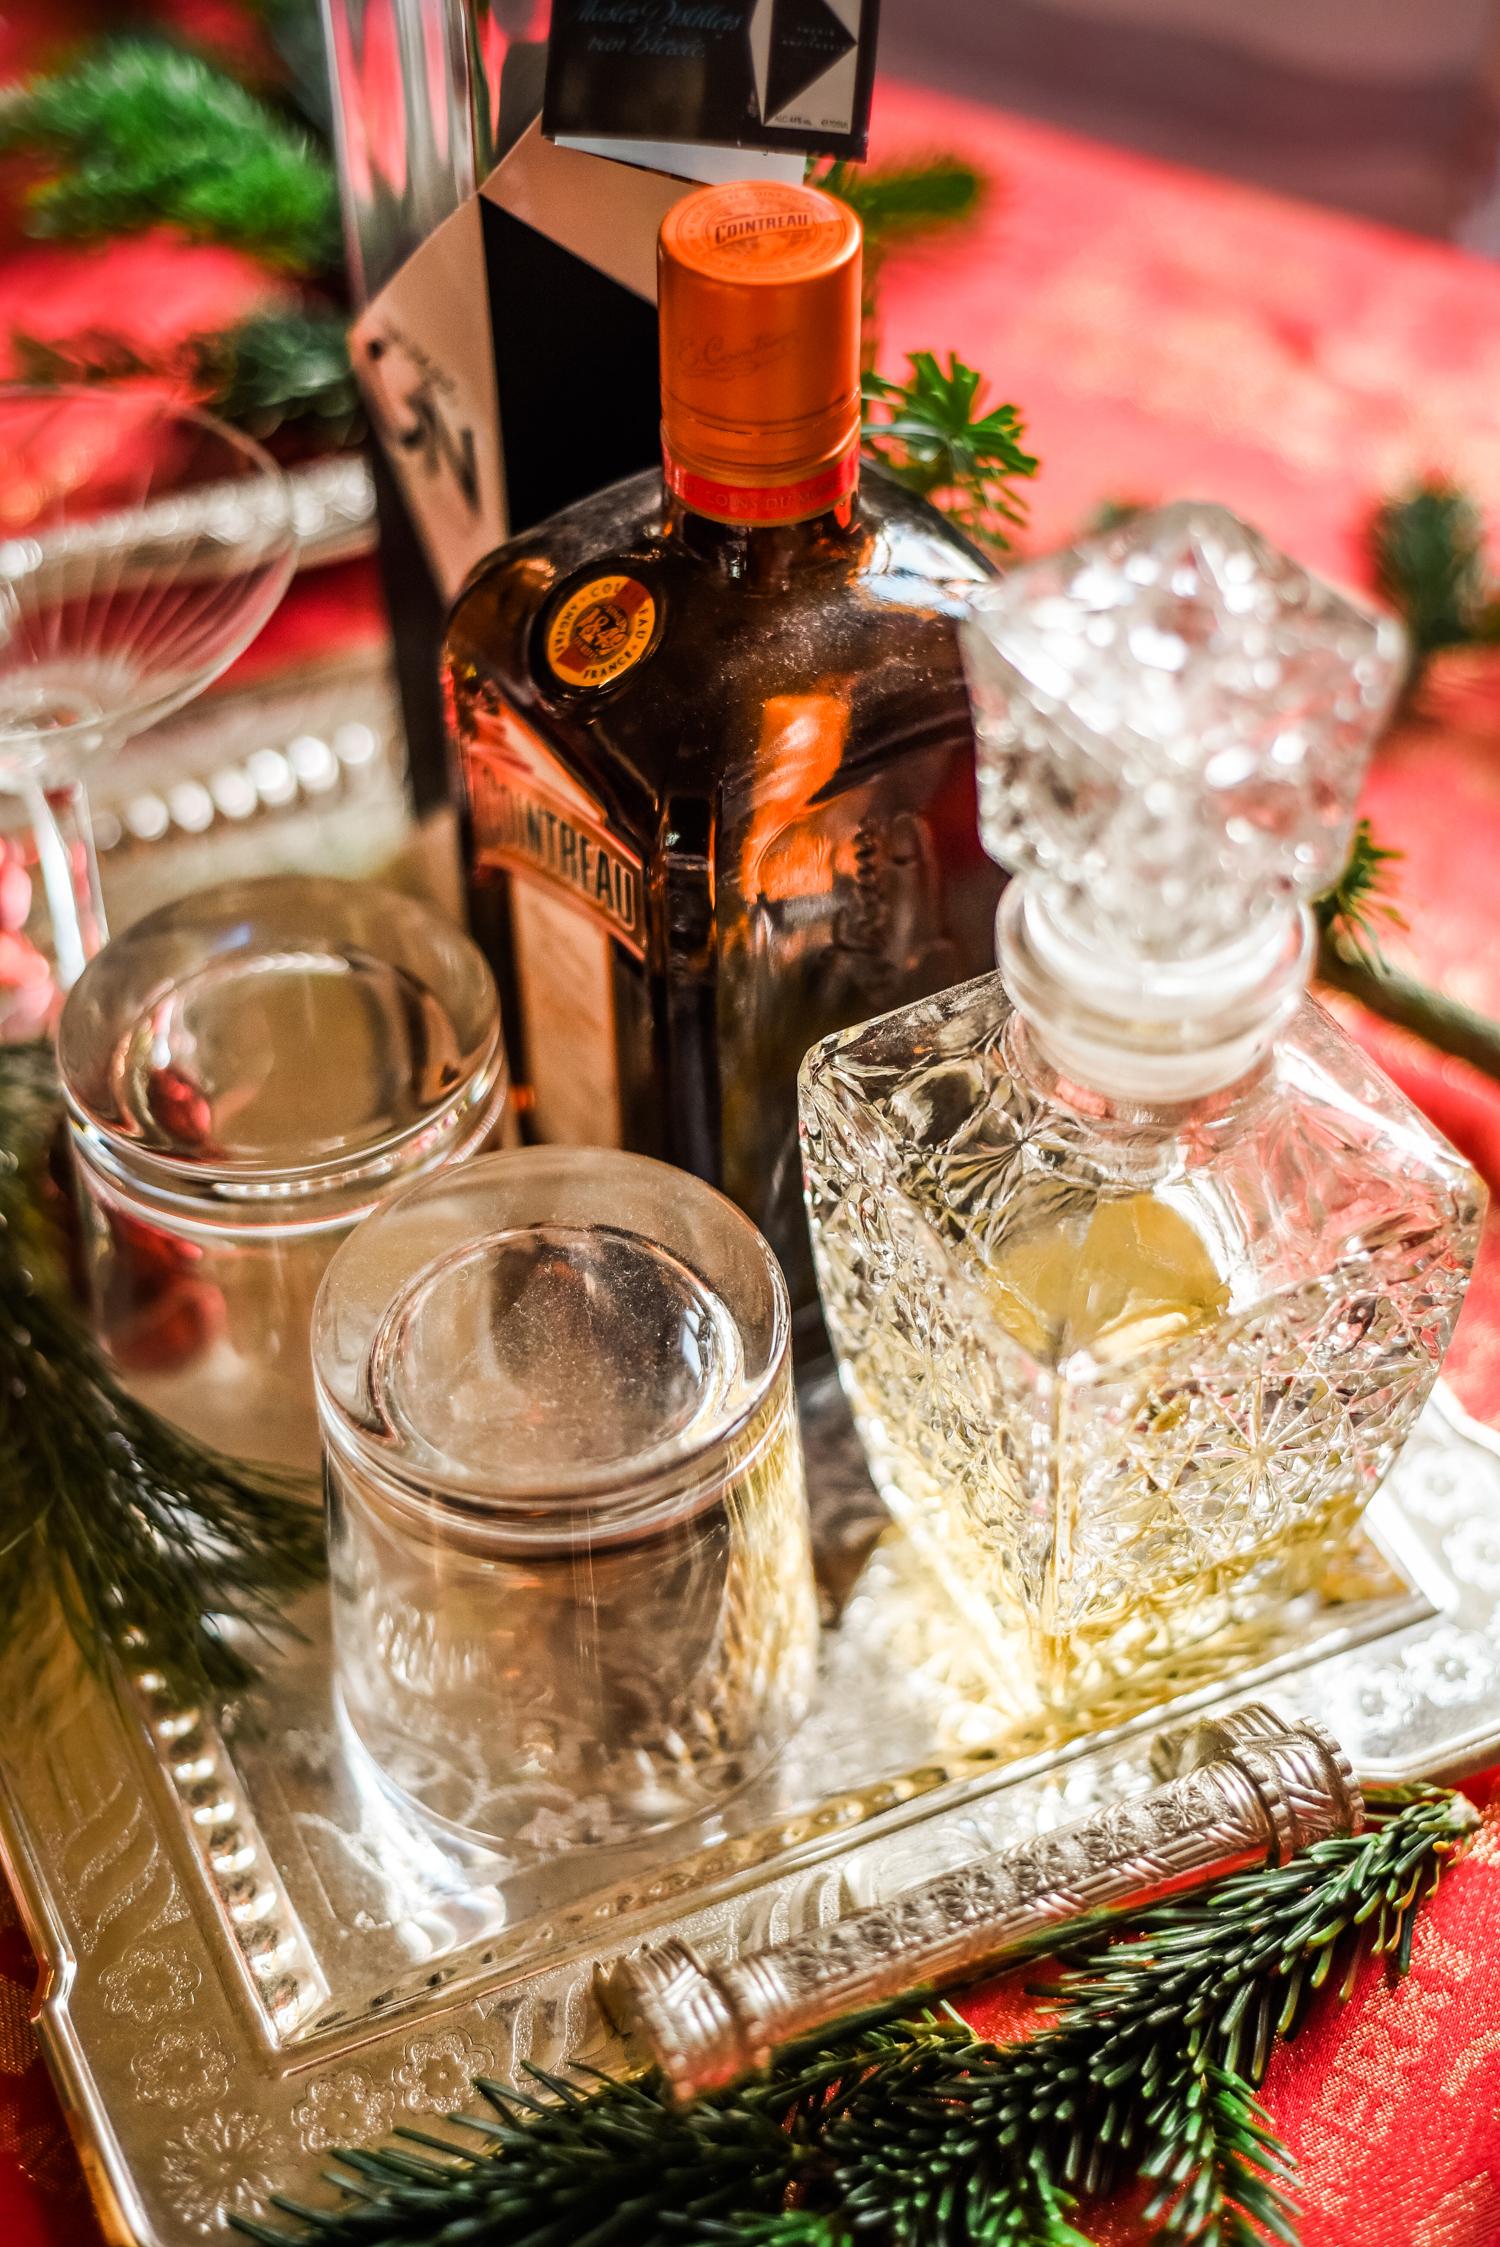 Traditional-Christmas-Decor-Tree-Table-Ideas-Style-To-Copy-AnaisStoelen-32.jpg